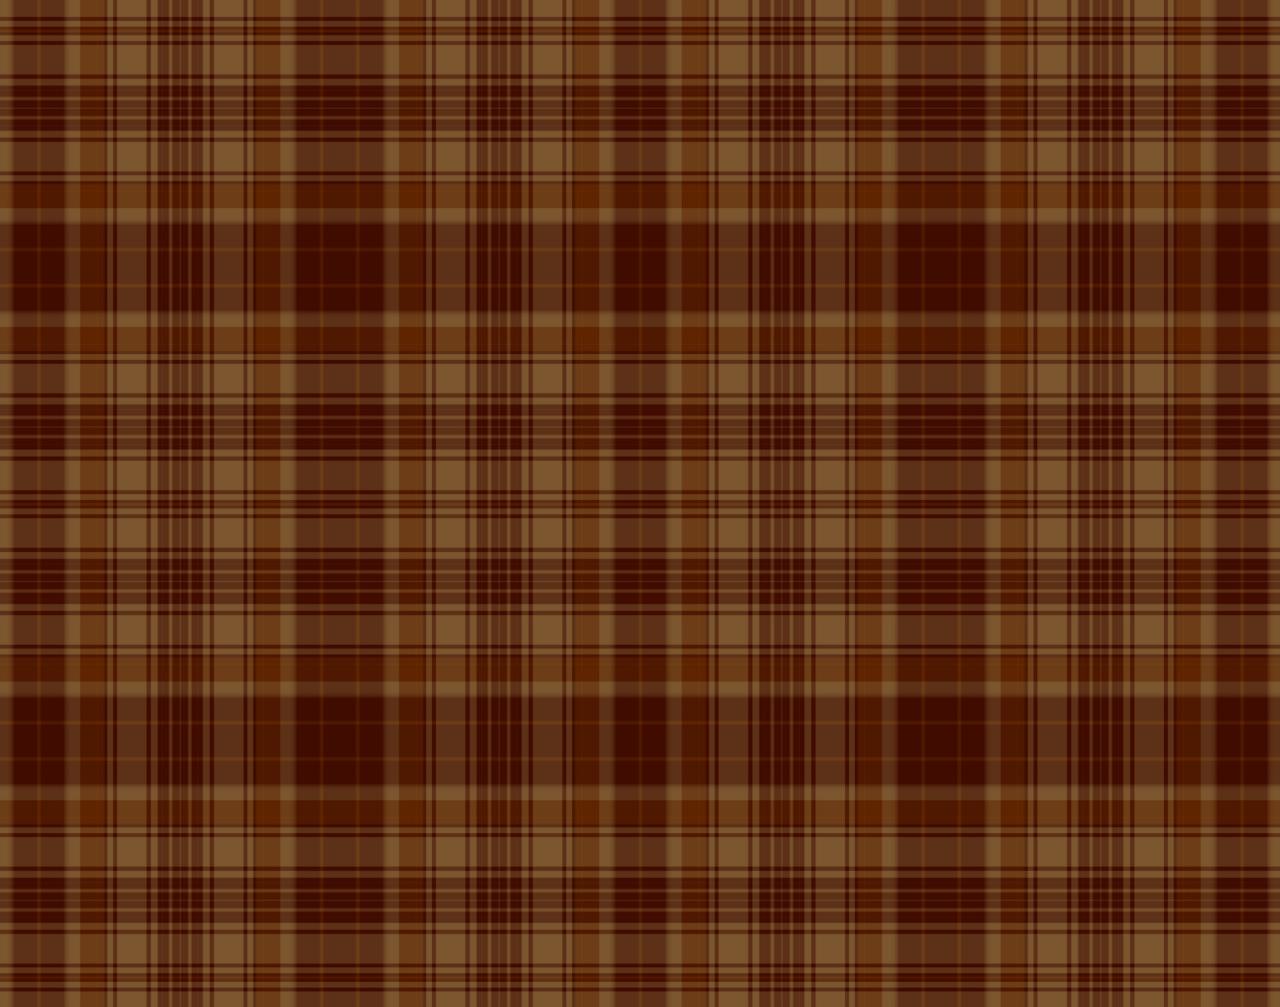 pin brown plaid wallpaper on pinterest. Black Bedroom Furniture Sets. Home Design Ideas